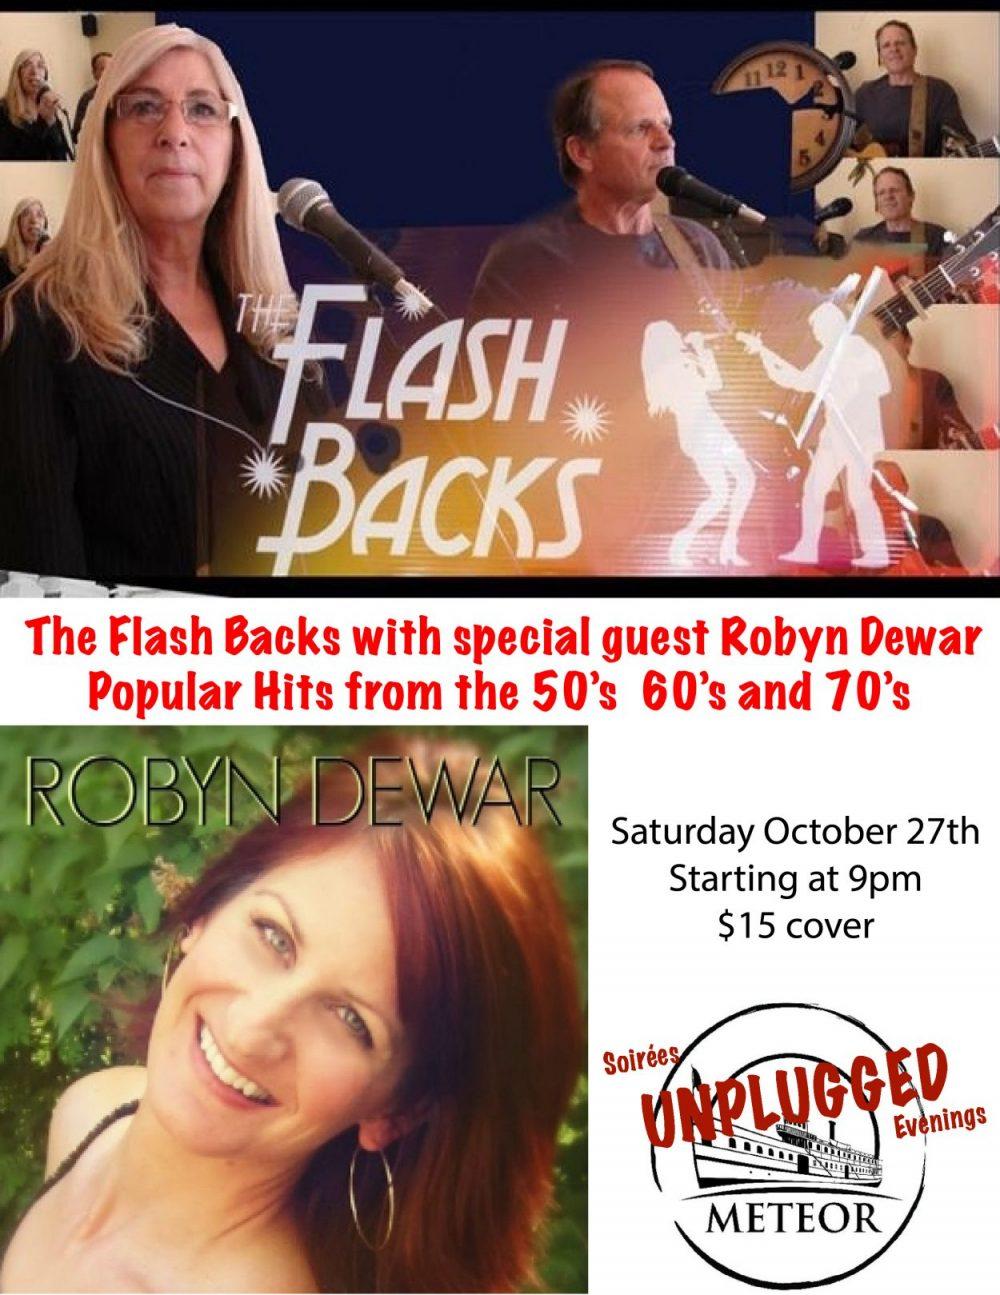 Flashbacks-RobynDewar-oct20-poster-e1539733572650.jpg